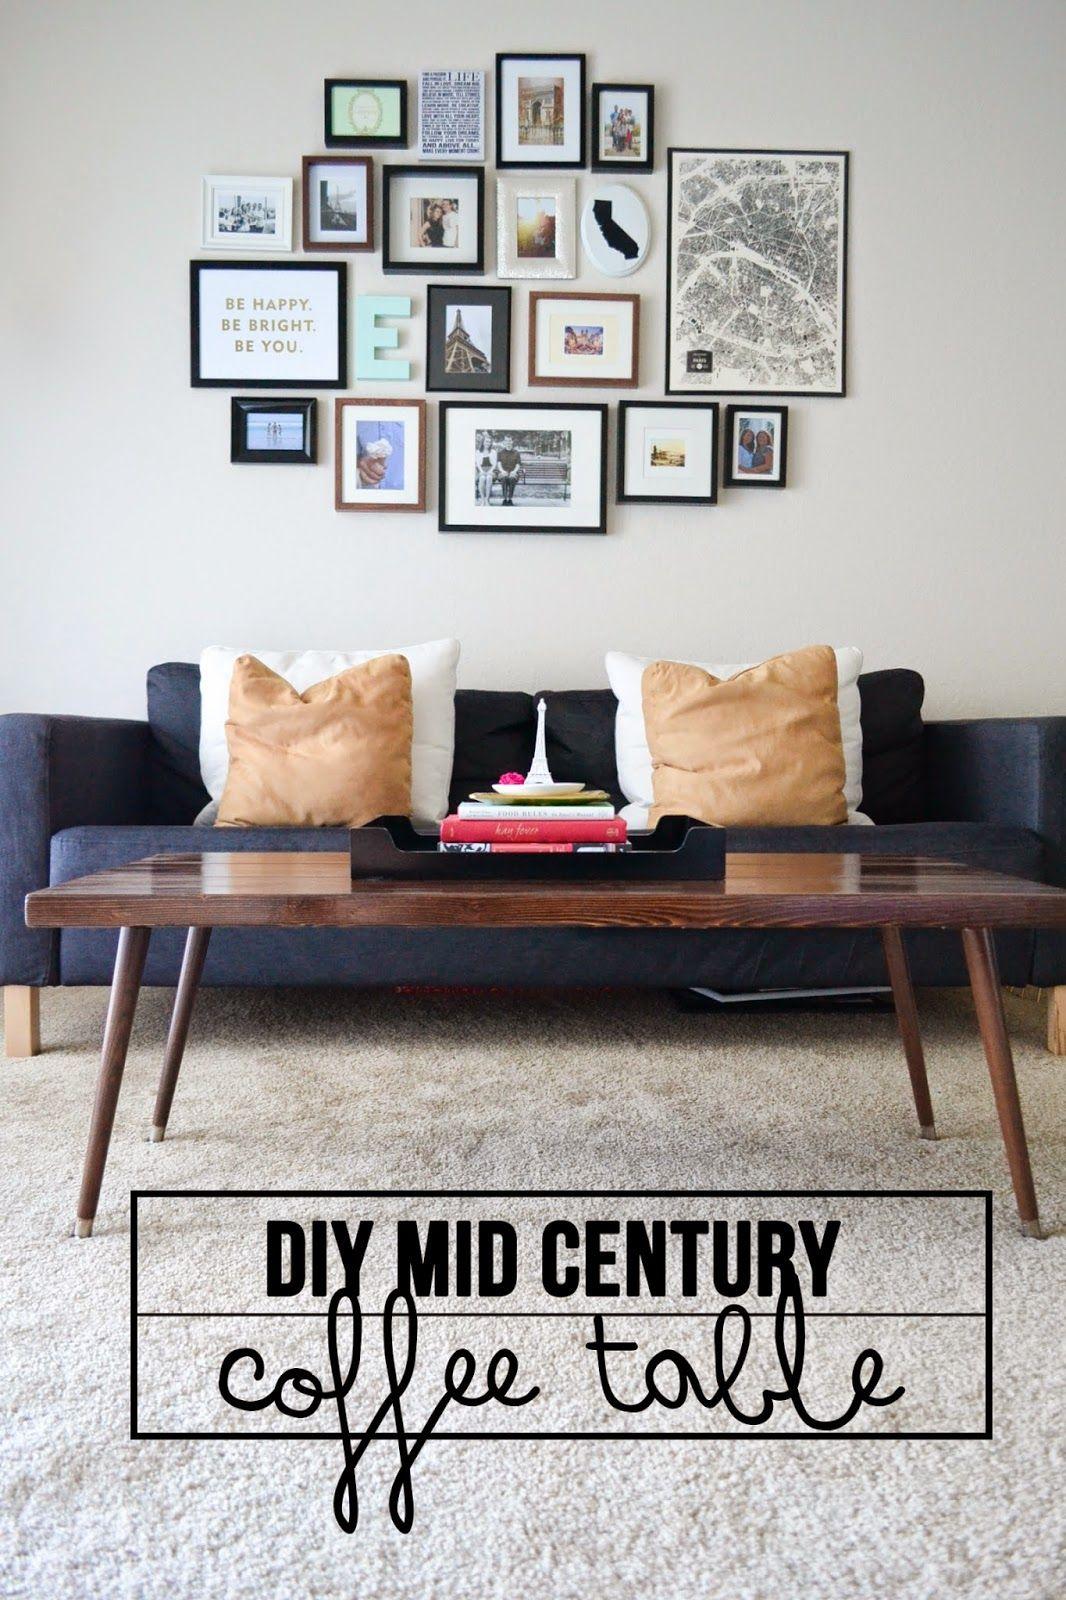 Diy Mid Century Coffee Table Contemporary Home Decor Mid Century Diy Mid Century Coffee Table [ 1600 x 1066 Pixel ]